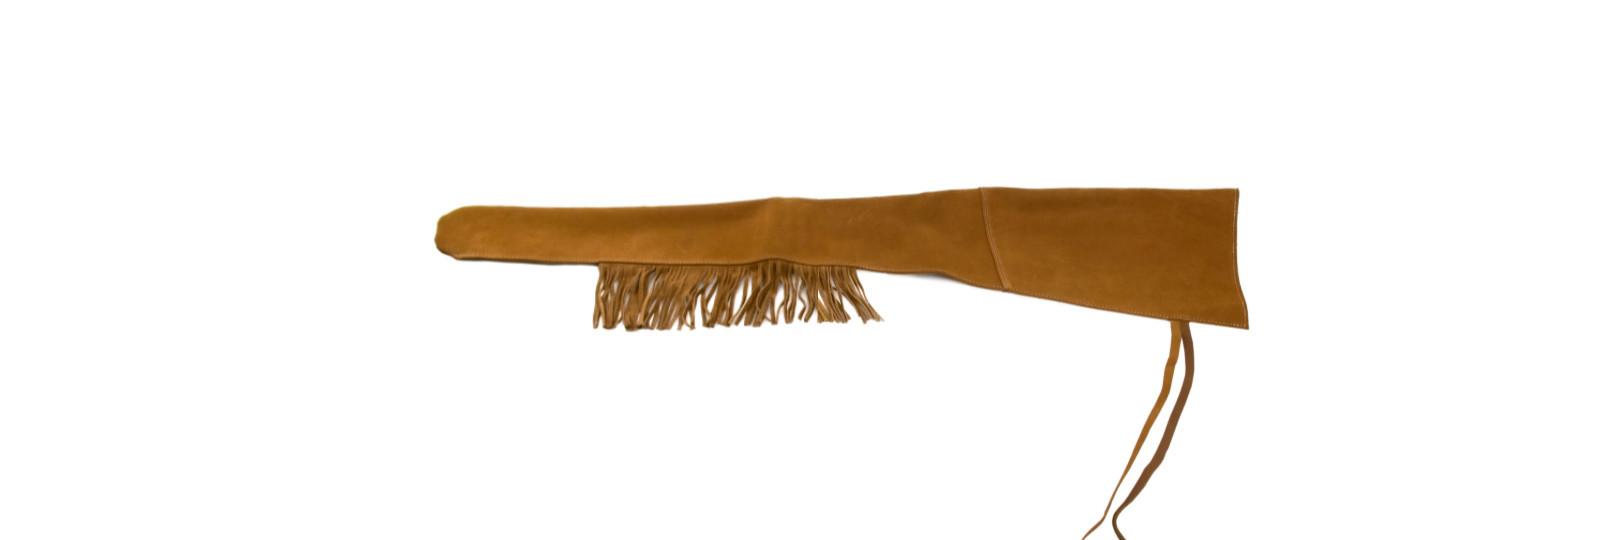 Short leather gun sleeve